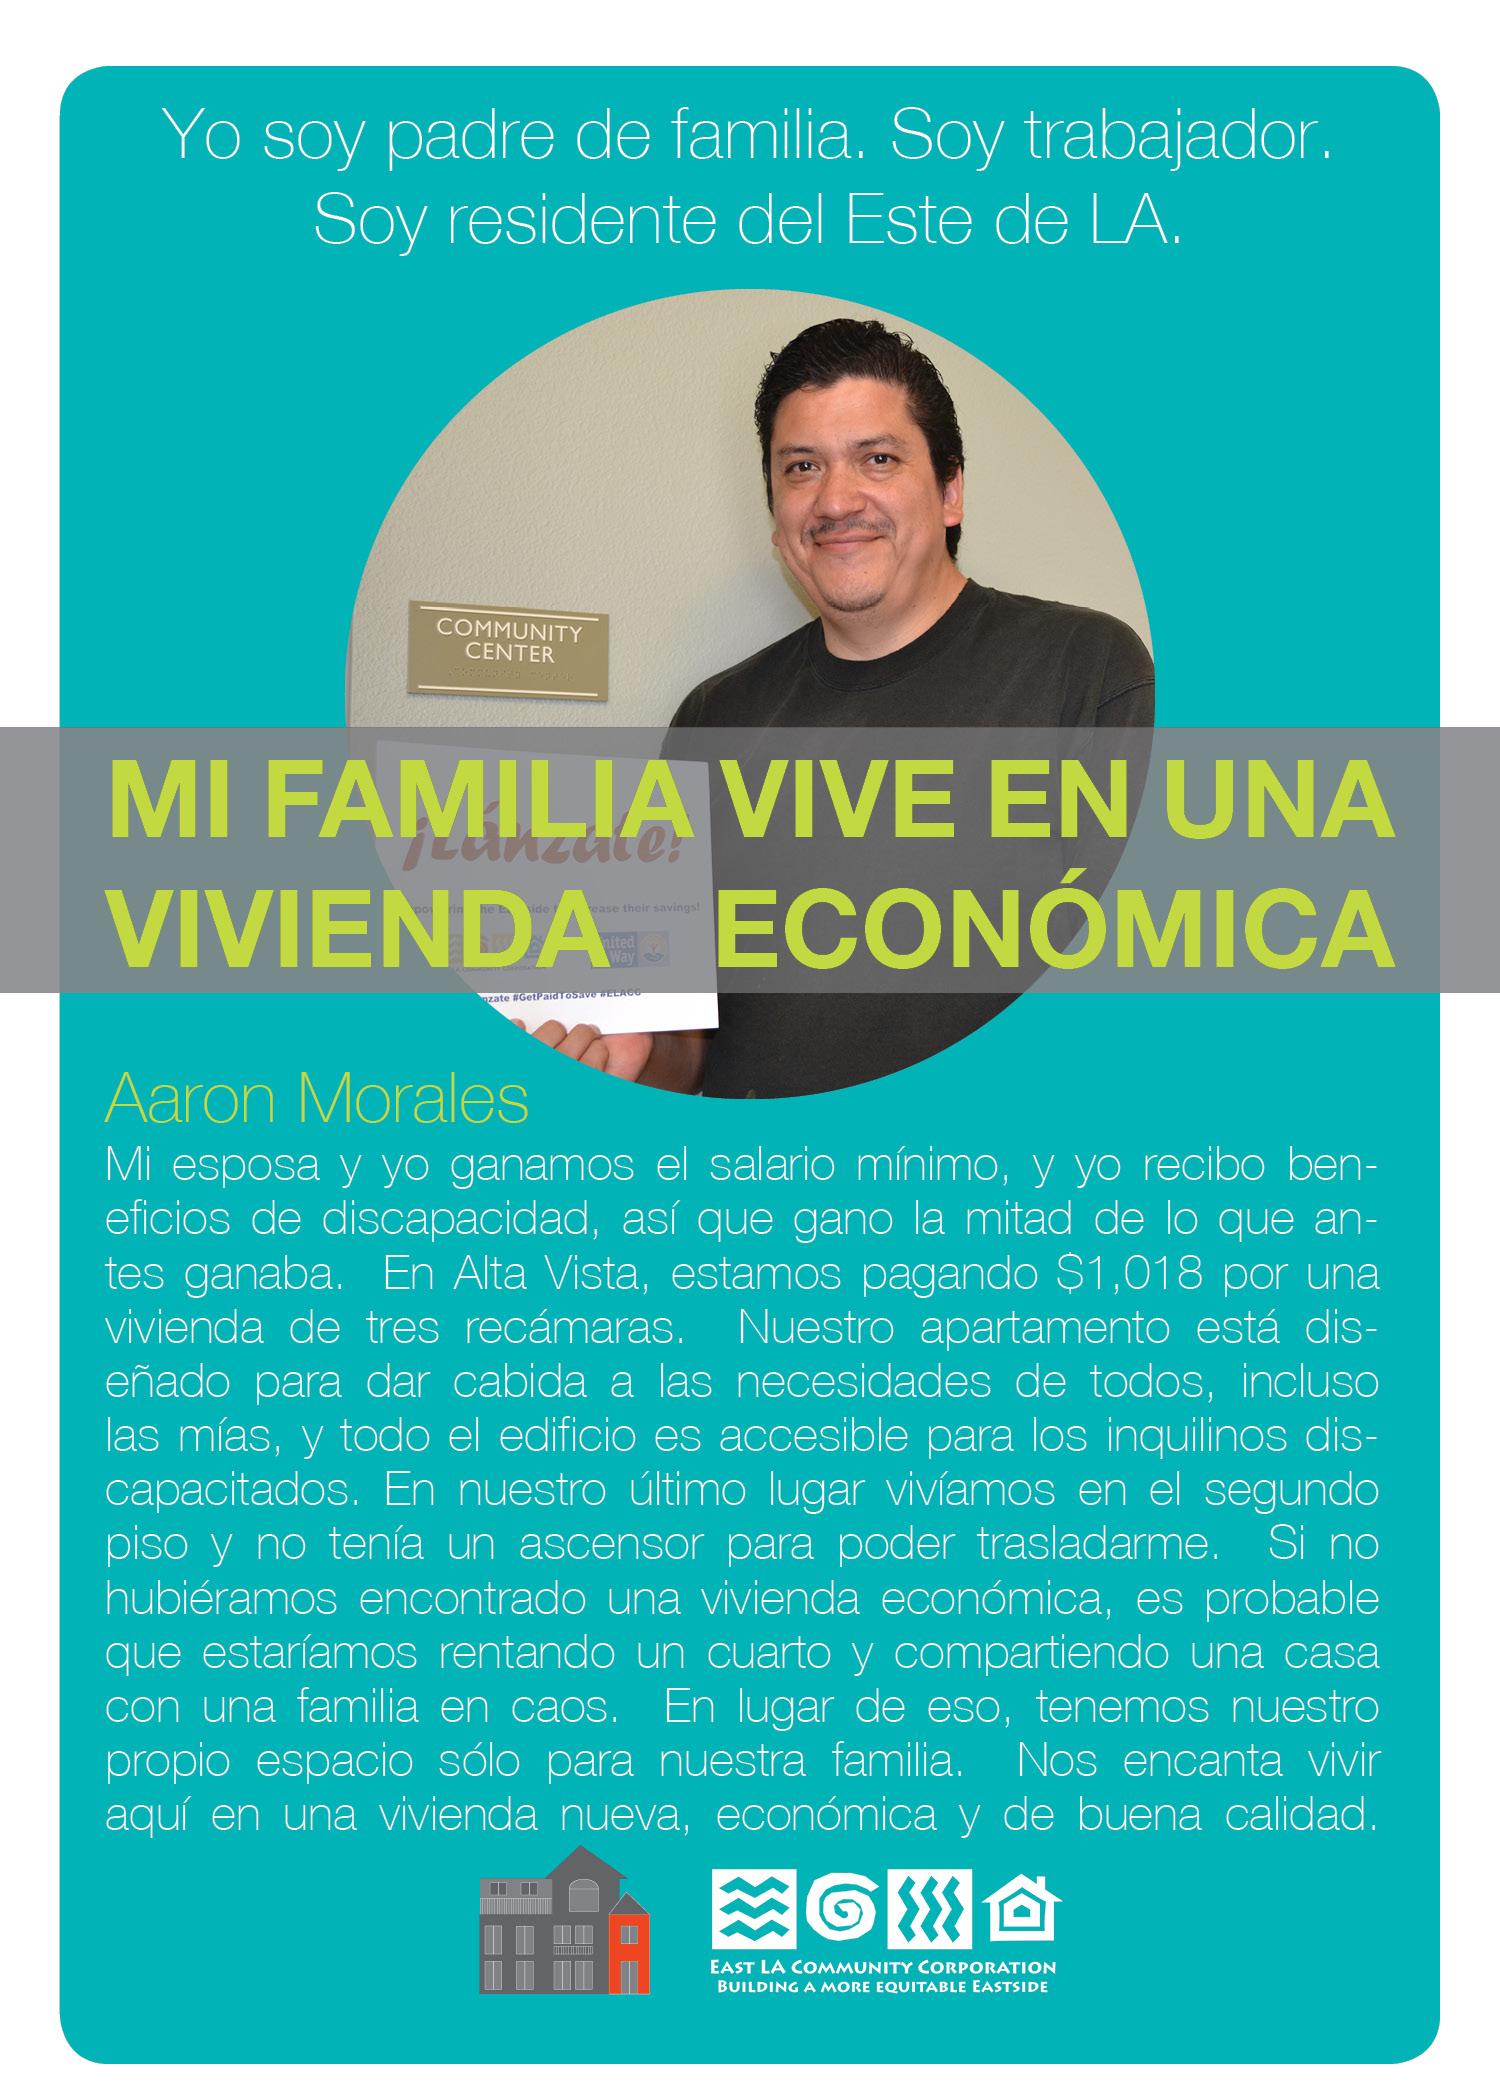 SPANISH_Live_in_Affordable_Housing-_Aaron-_JPEG.jpg